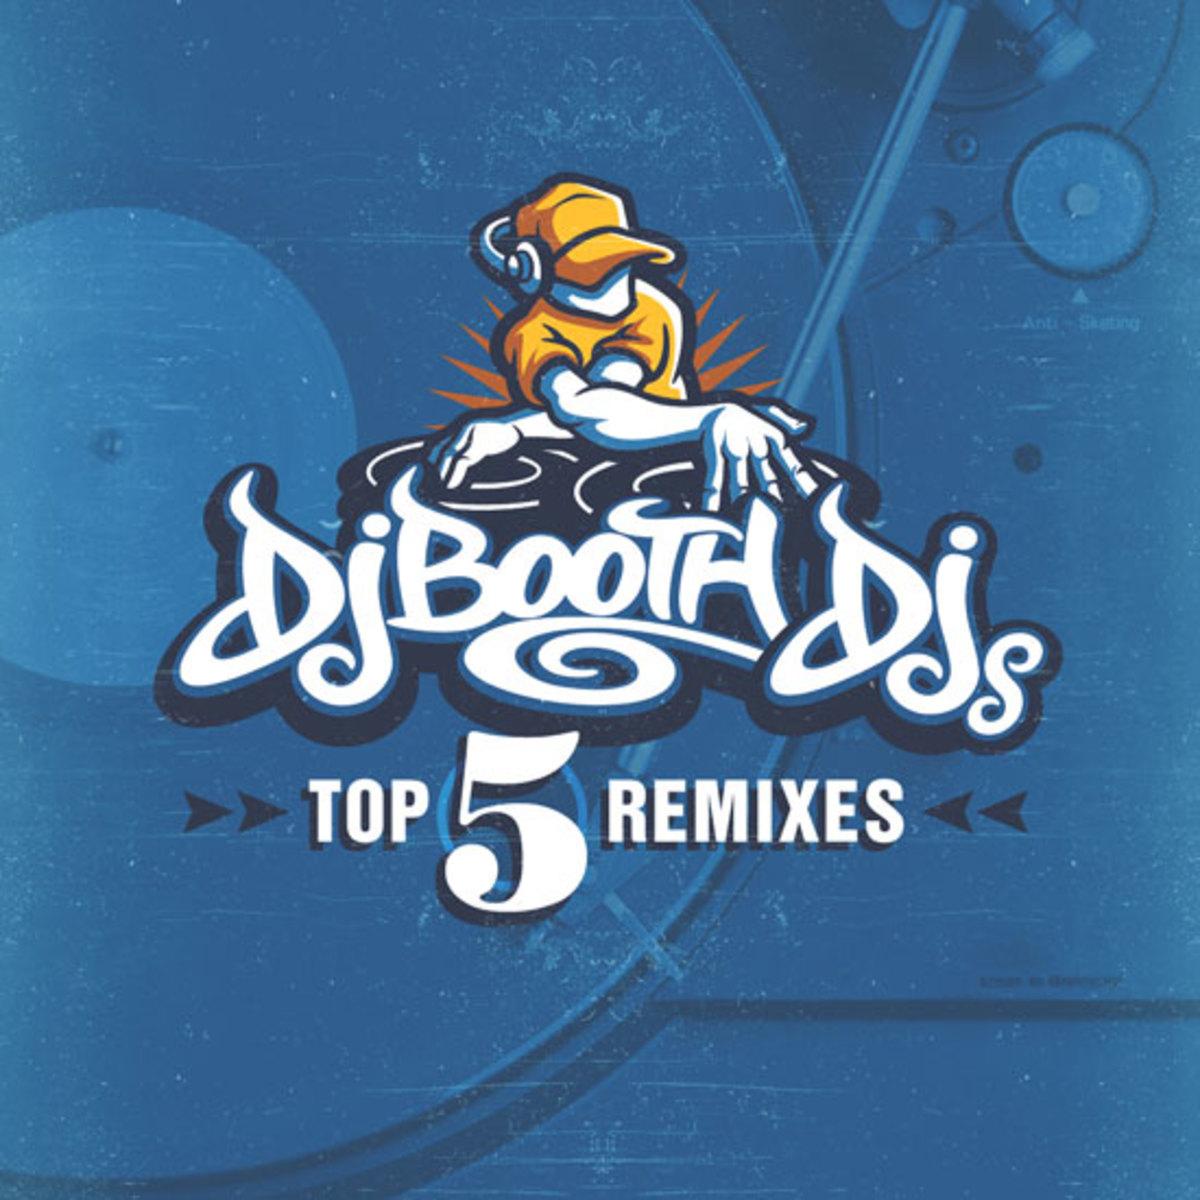 DJBooth-DJTop5web.jpg